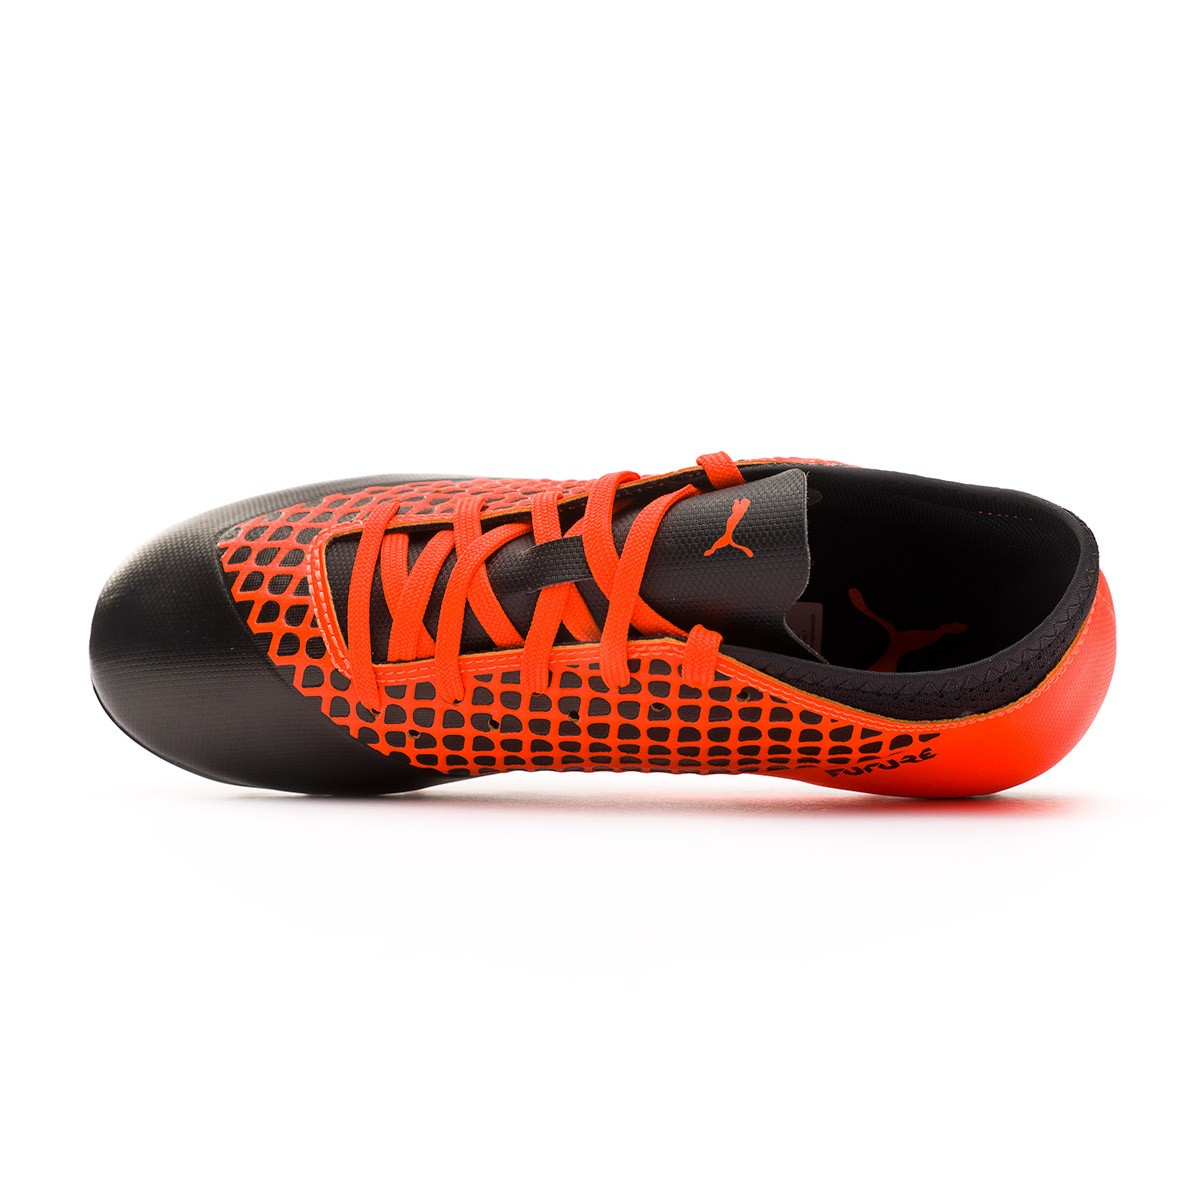 362d8a772 Bota de fútbol Puma Future 2.4 MG Niño Puma black-Shocking orange - Tienda  de fútbol Fútbol Emotion